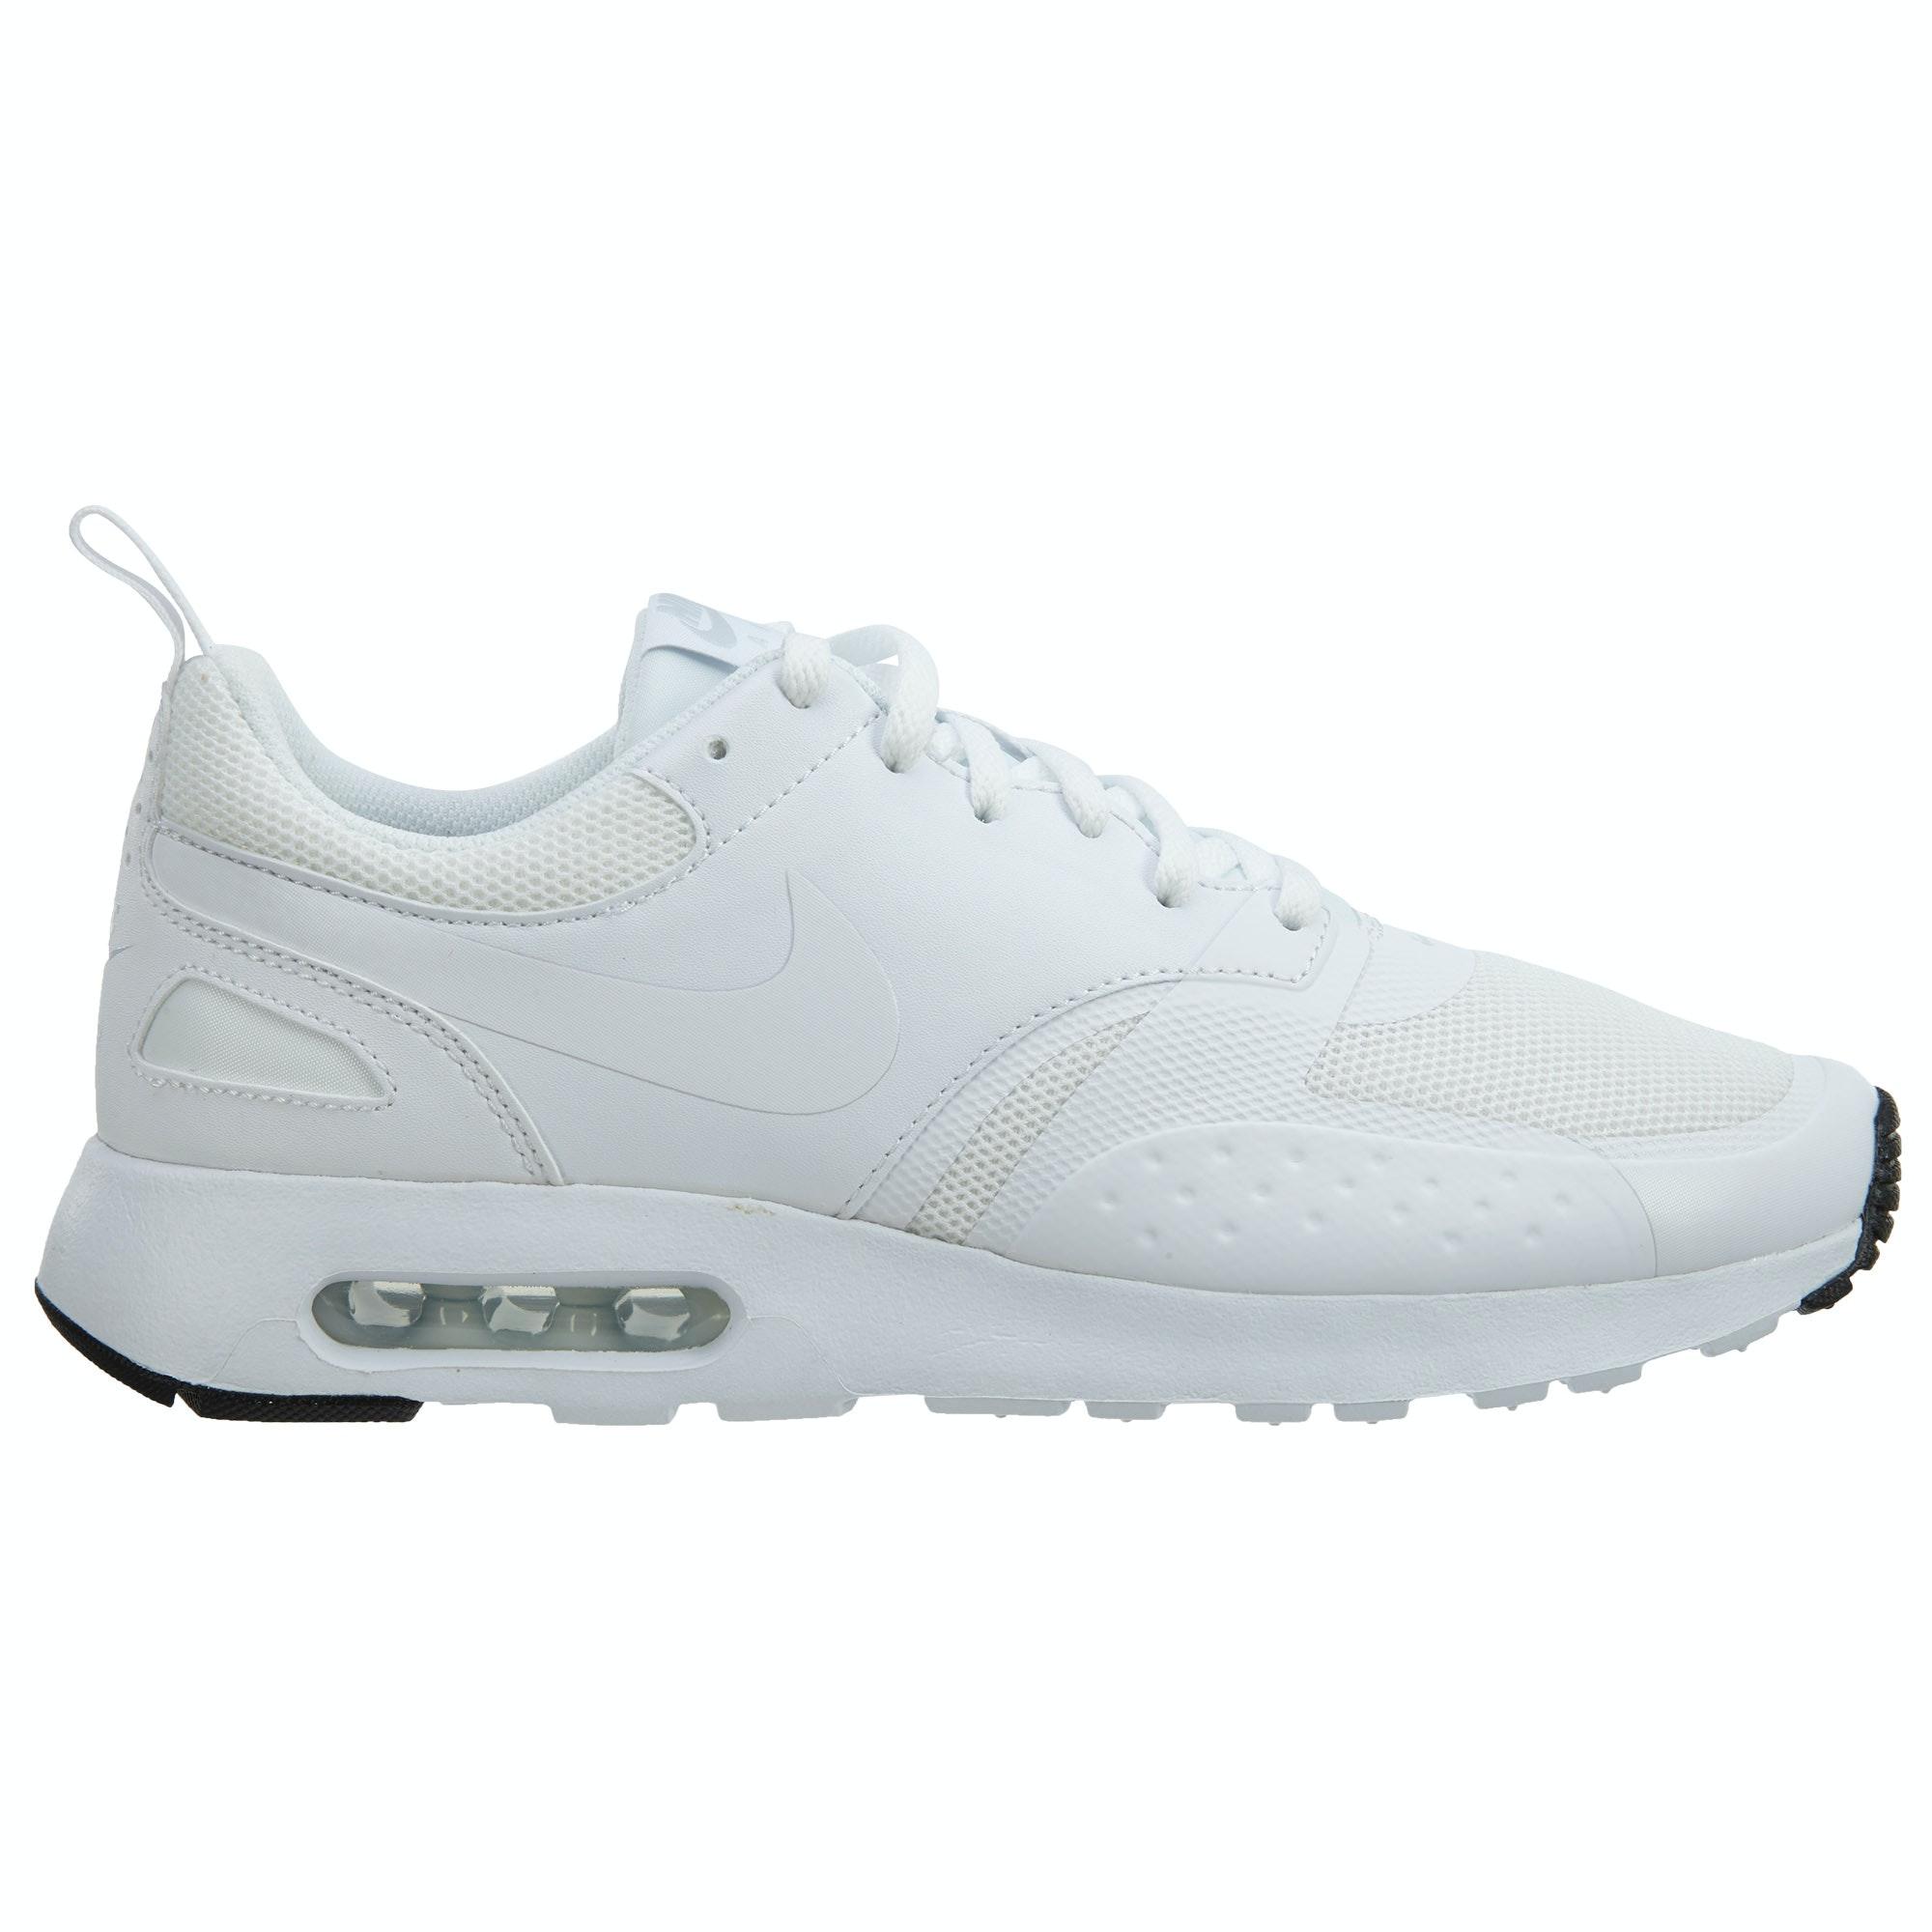 Nike Air Max Vision White/White-Pure Platinum